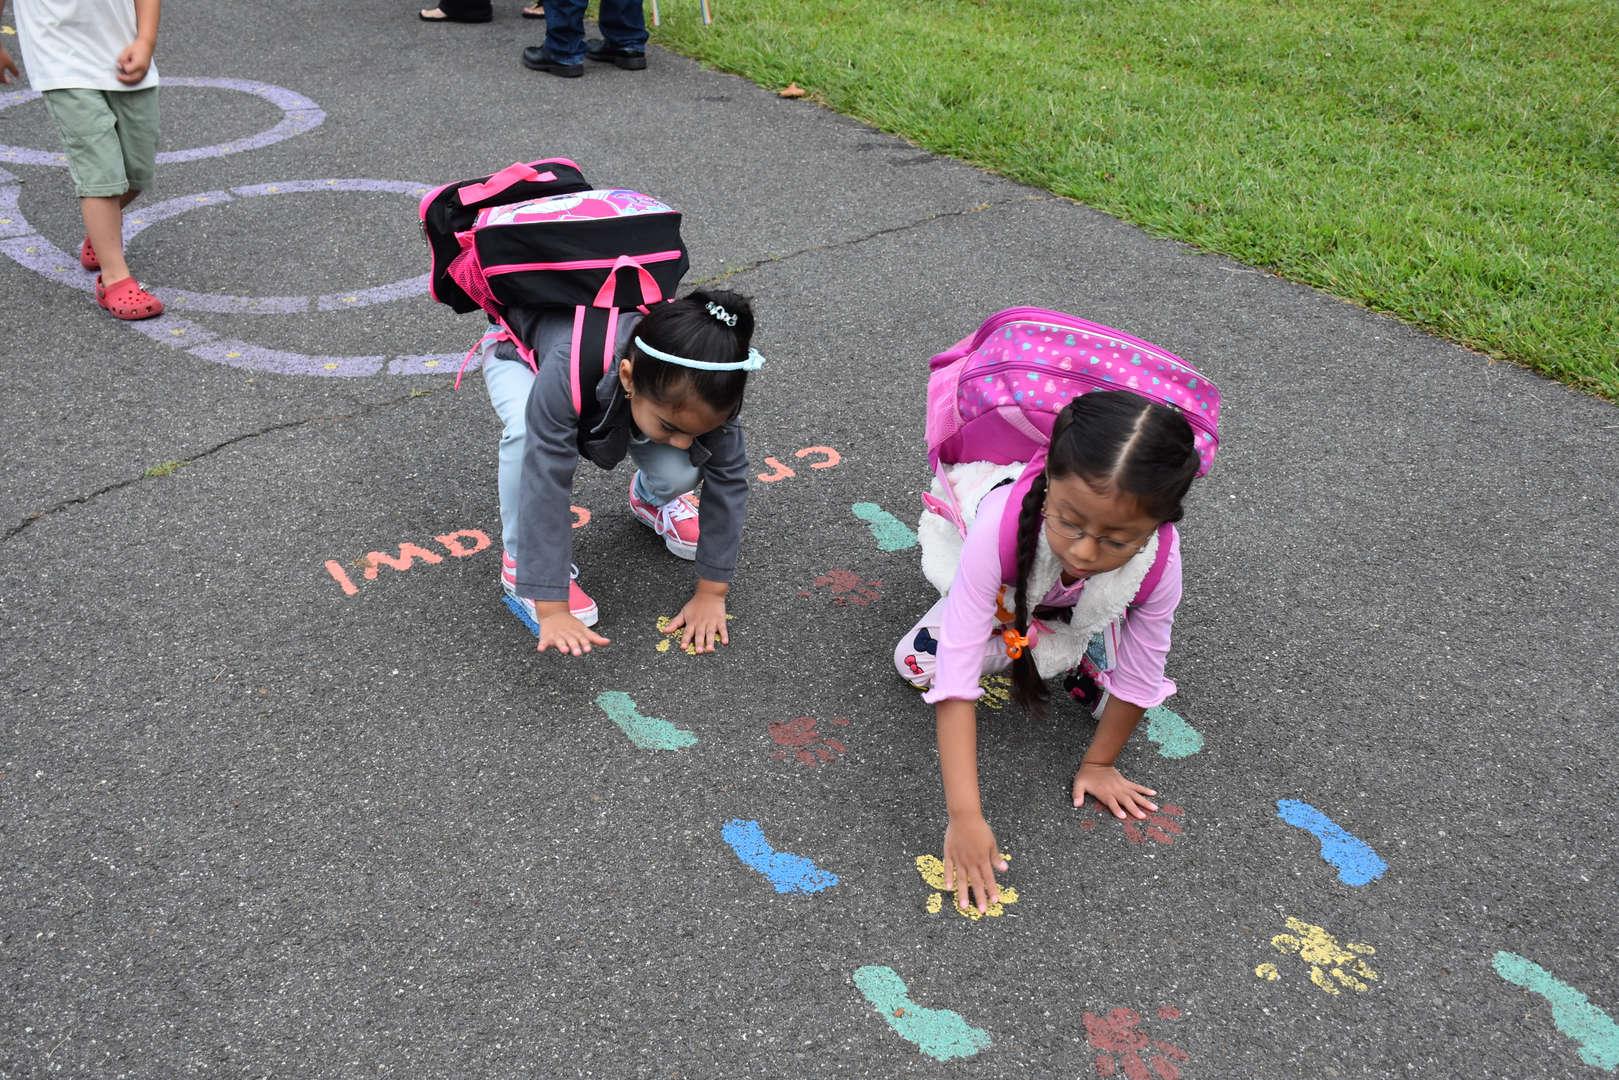 2 girls on activity path